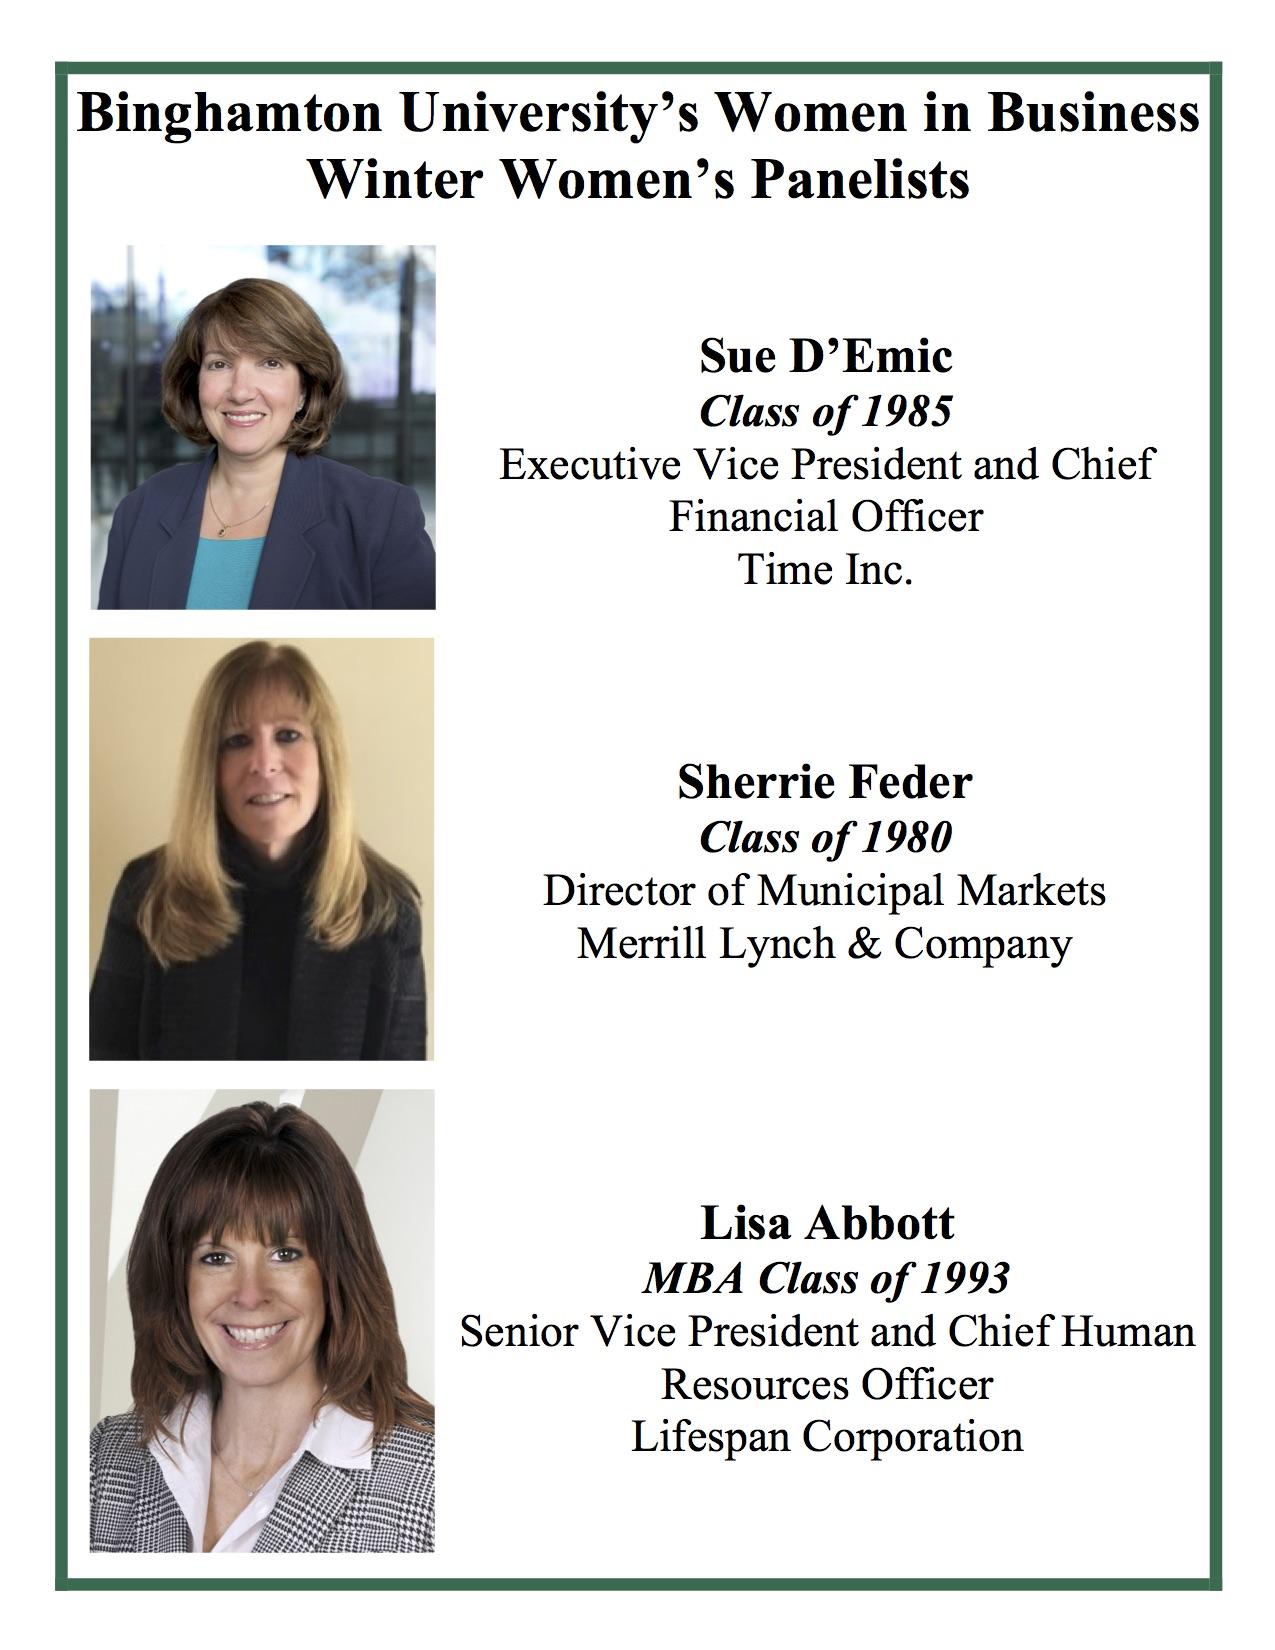 Binghamton_University_s_Women_in_Business_Winter_Women_s_Panelists.jpg